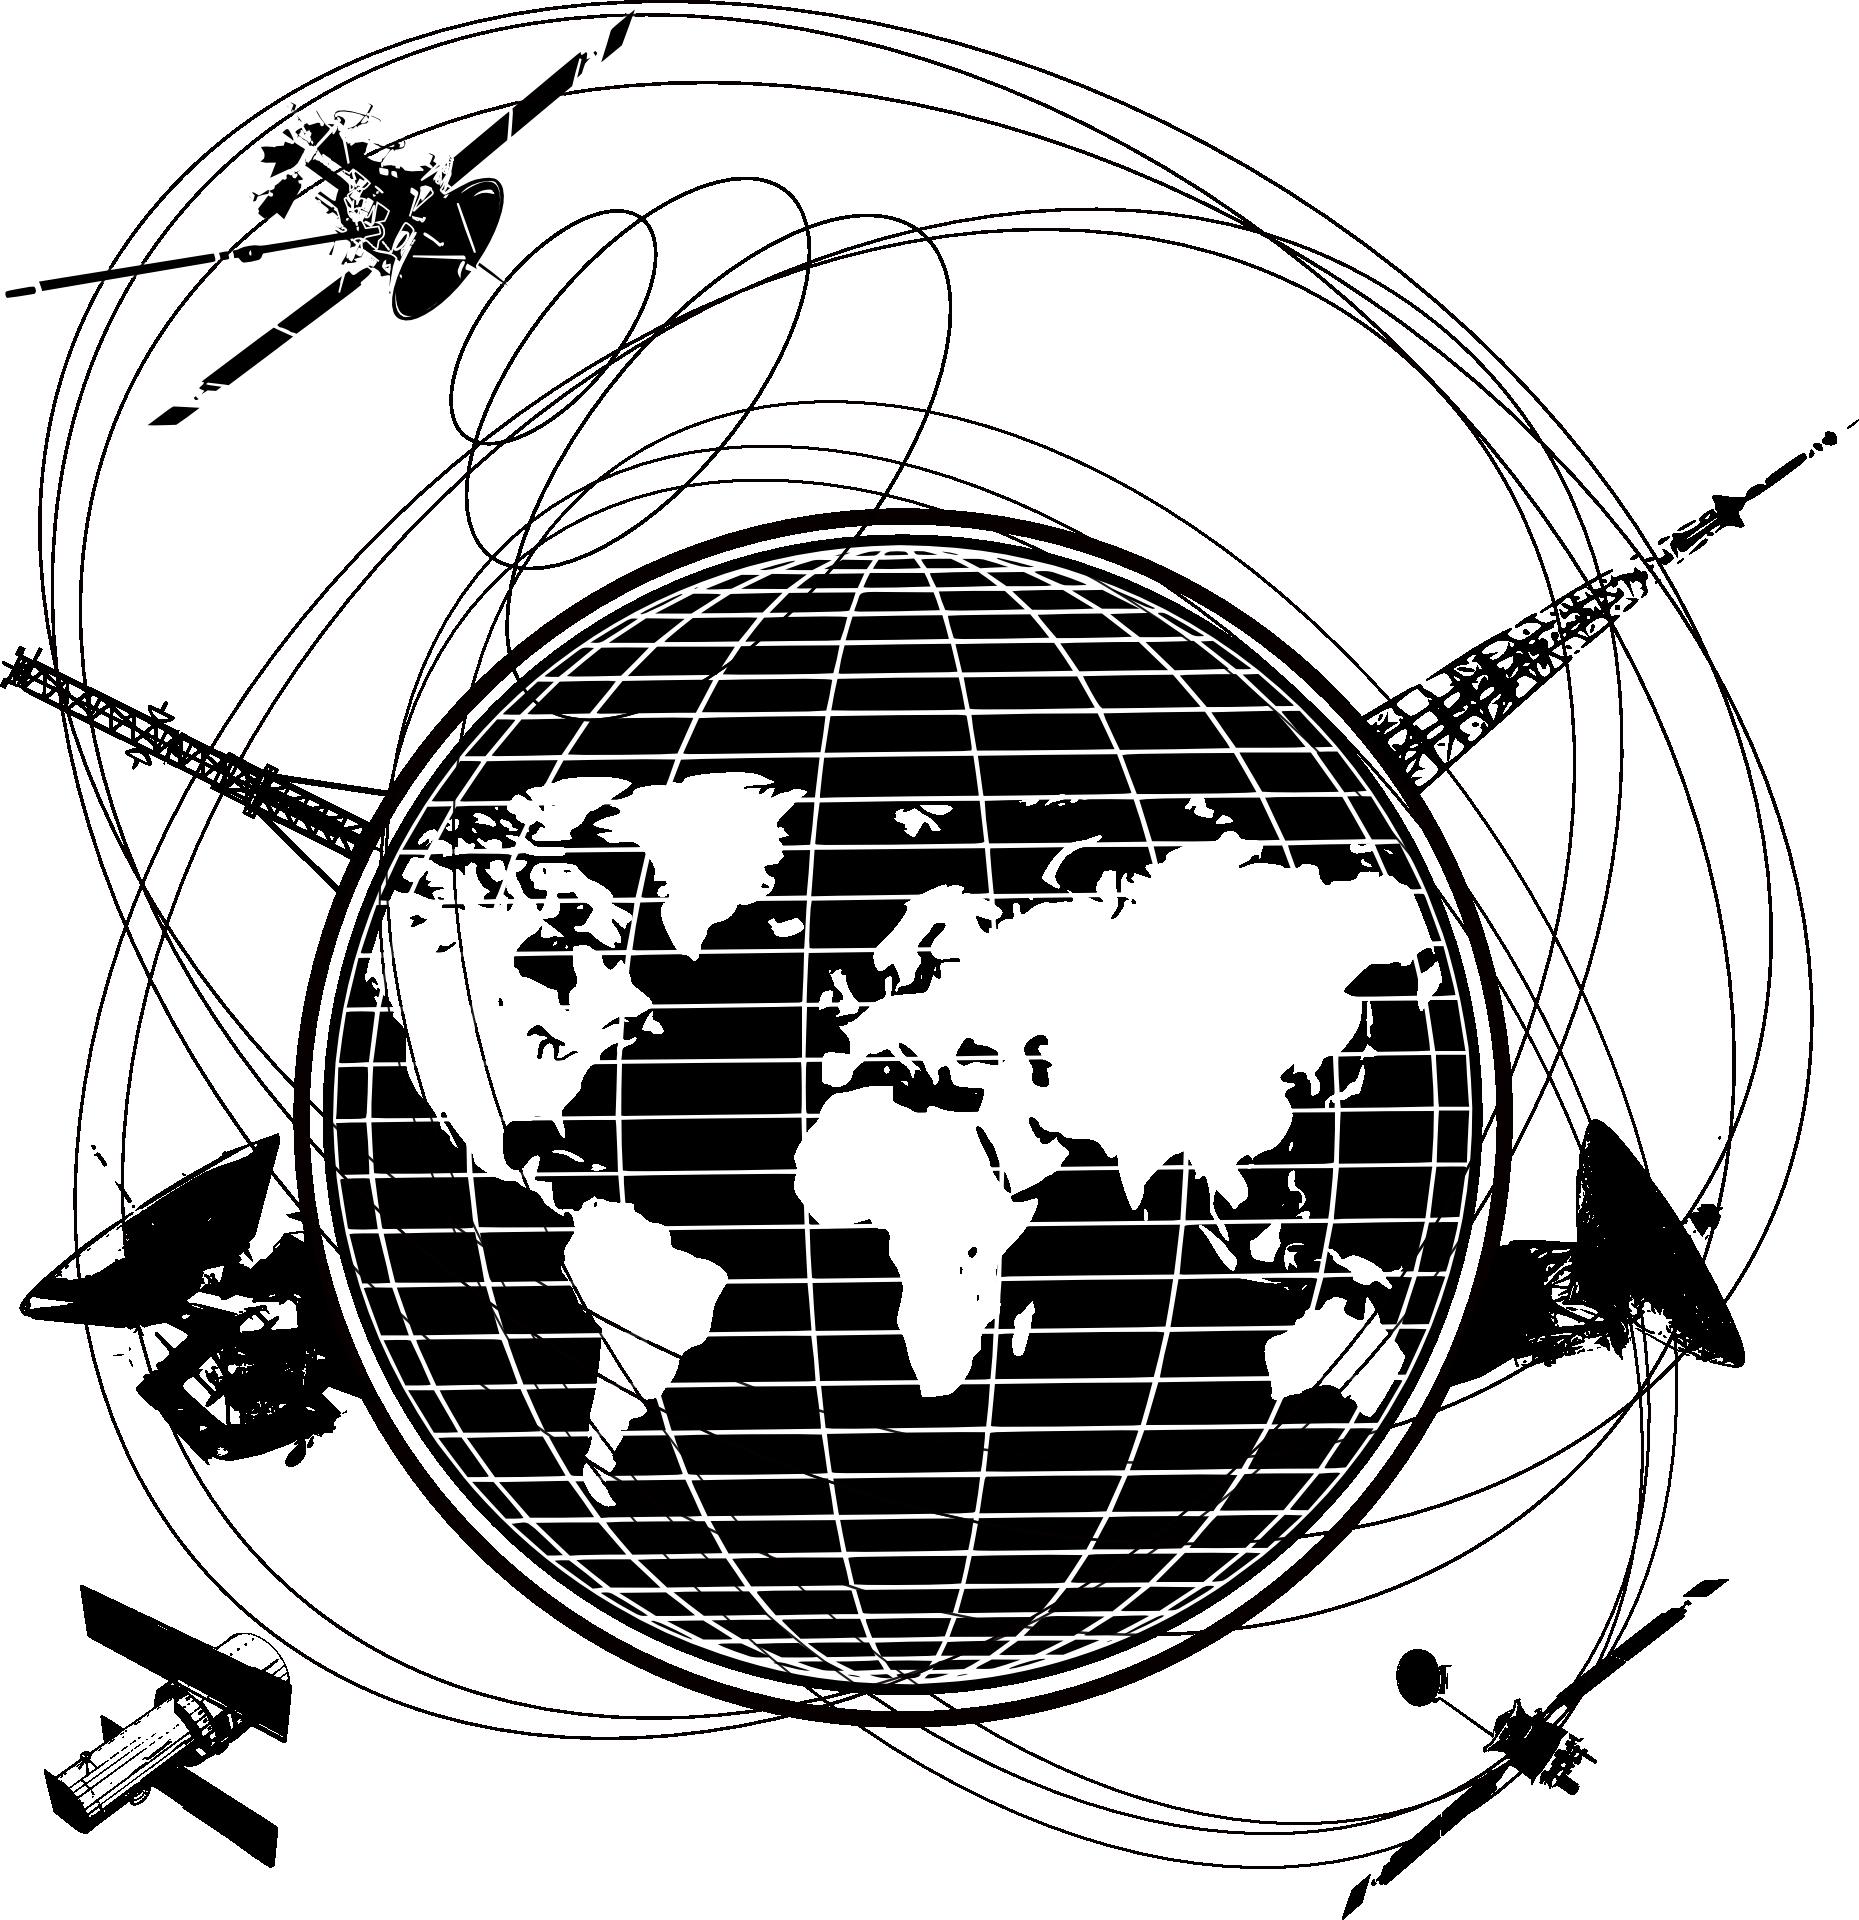 High capacity photonic beamforming for phased antennas